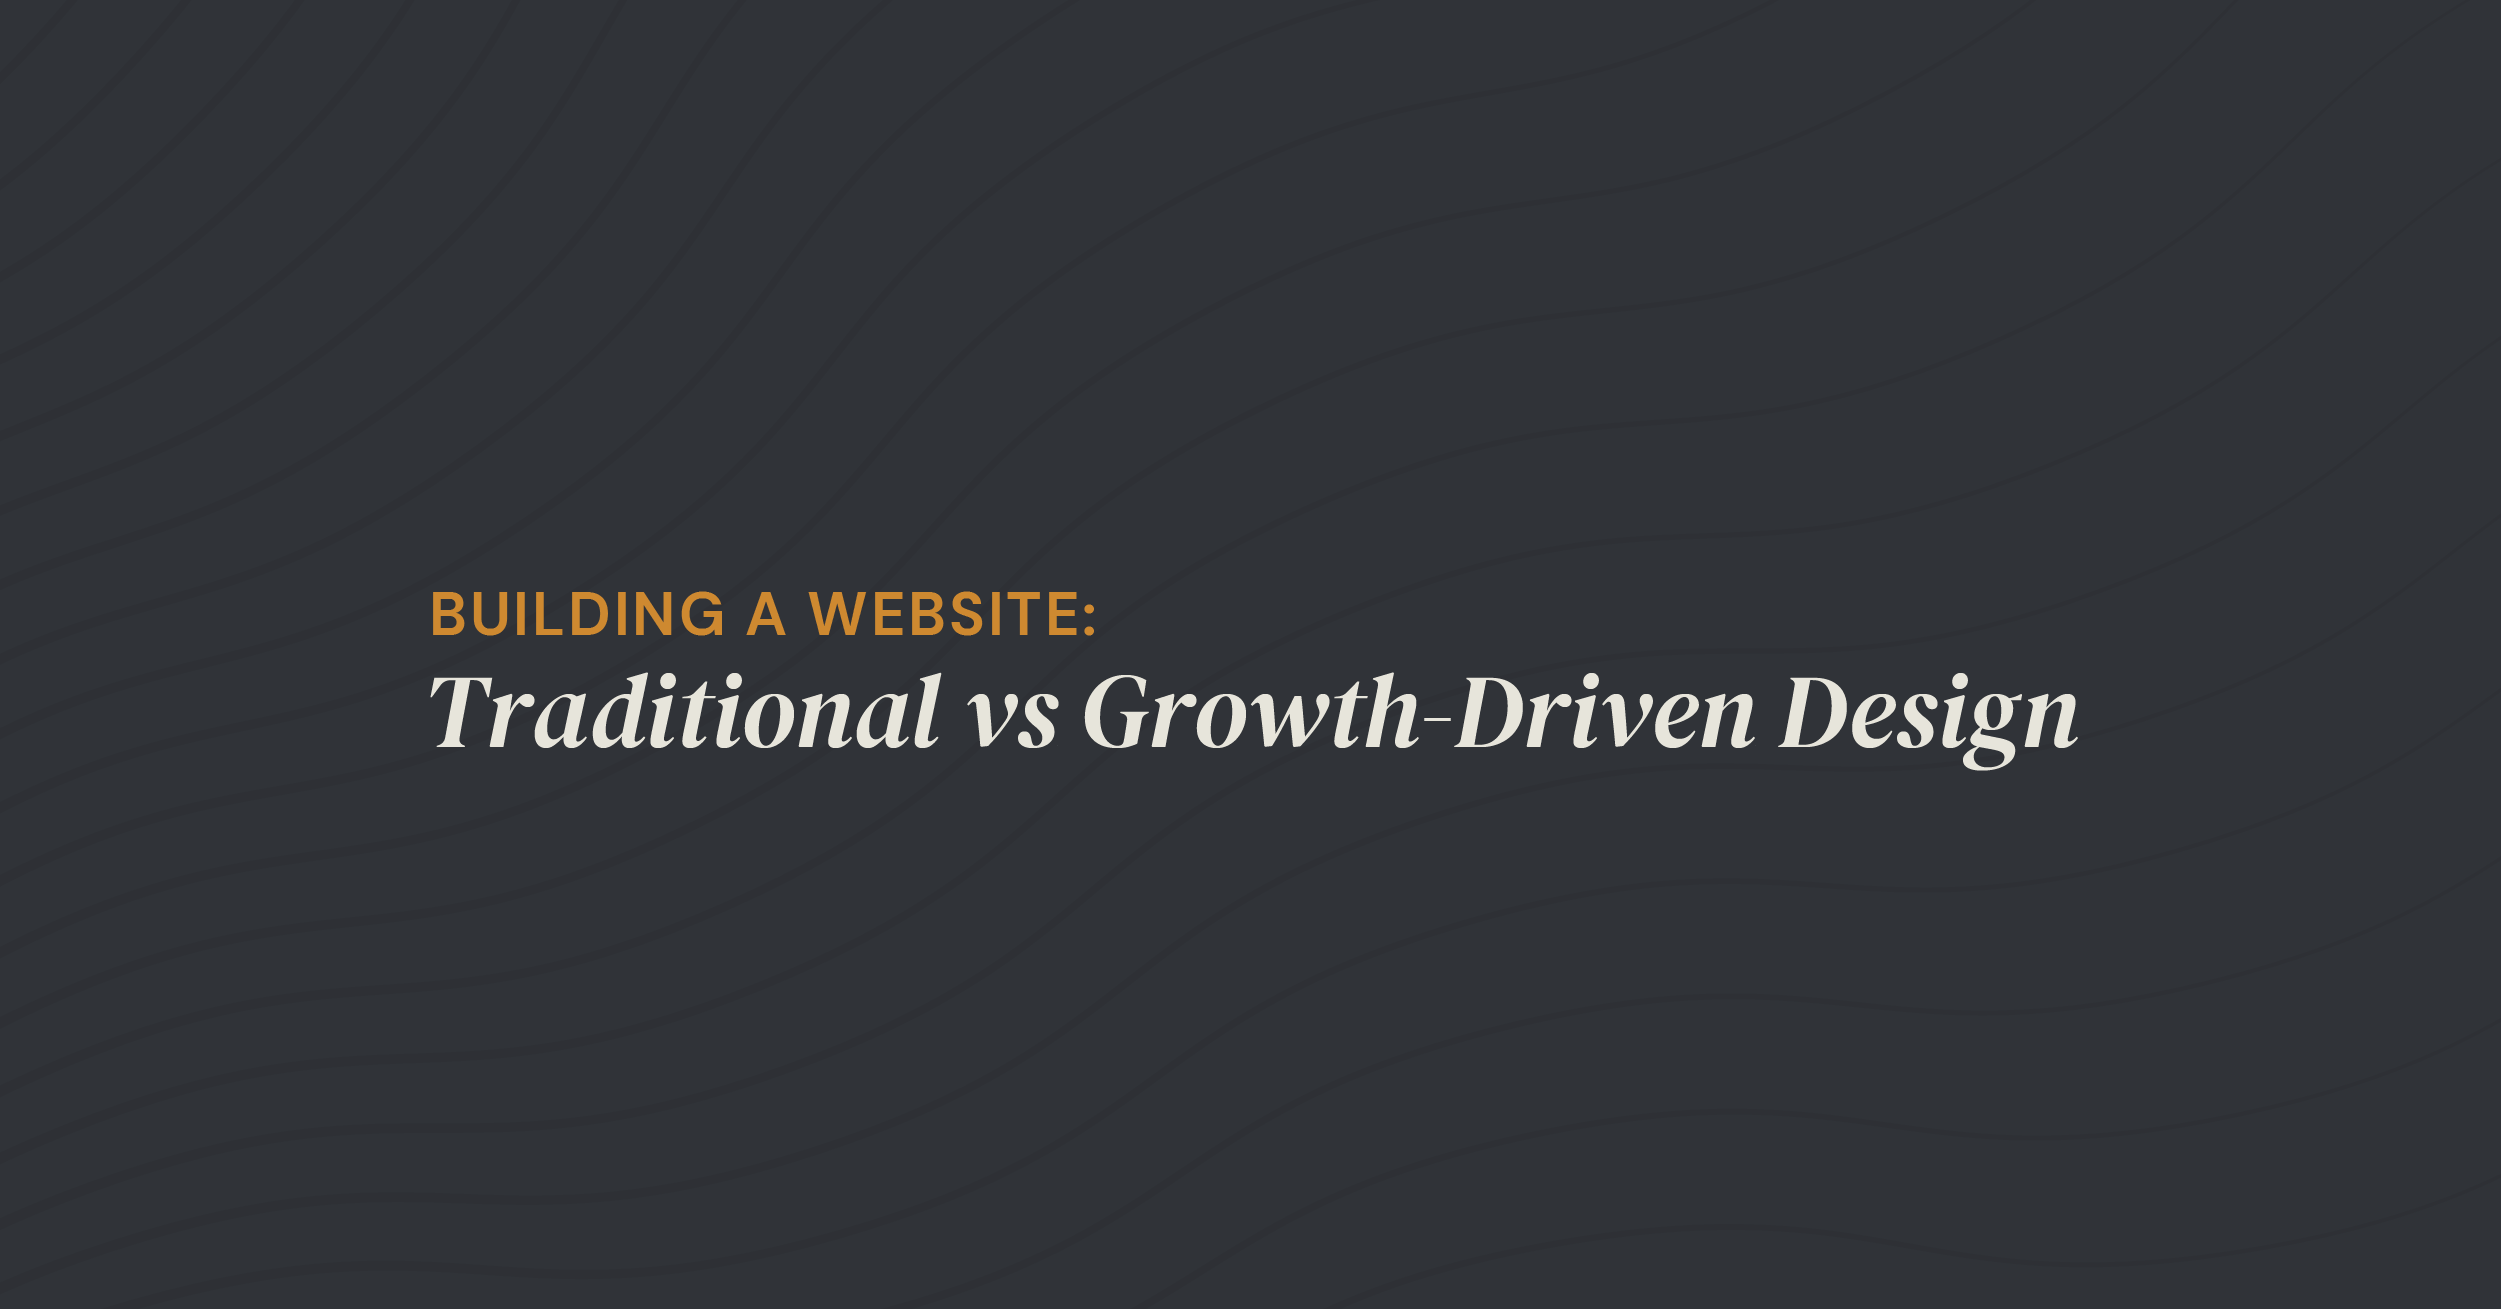 Building a Website: Traditional vs GDD